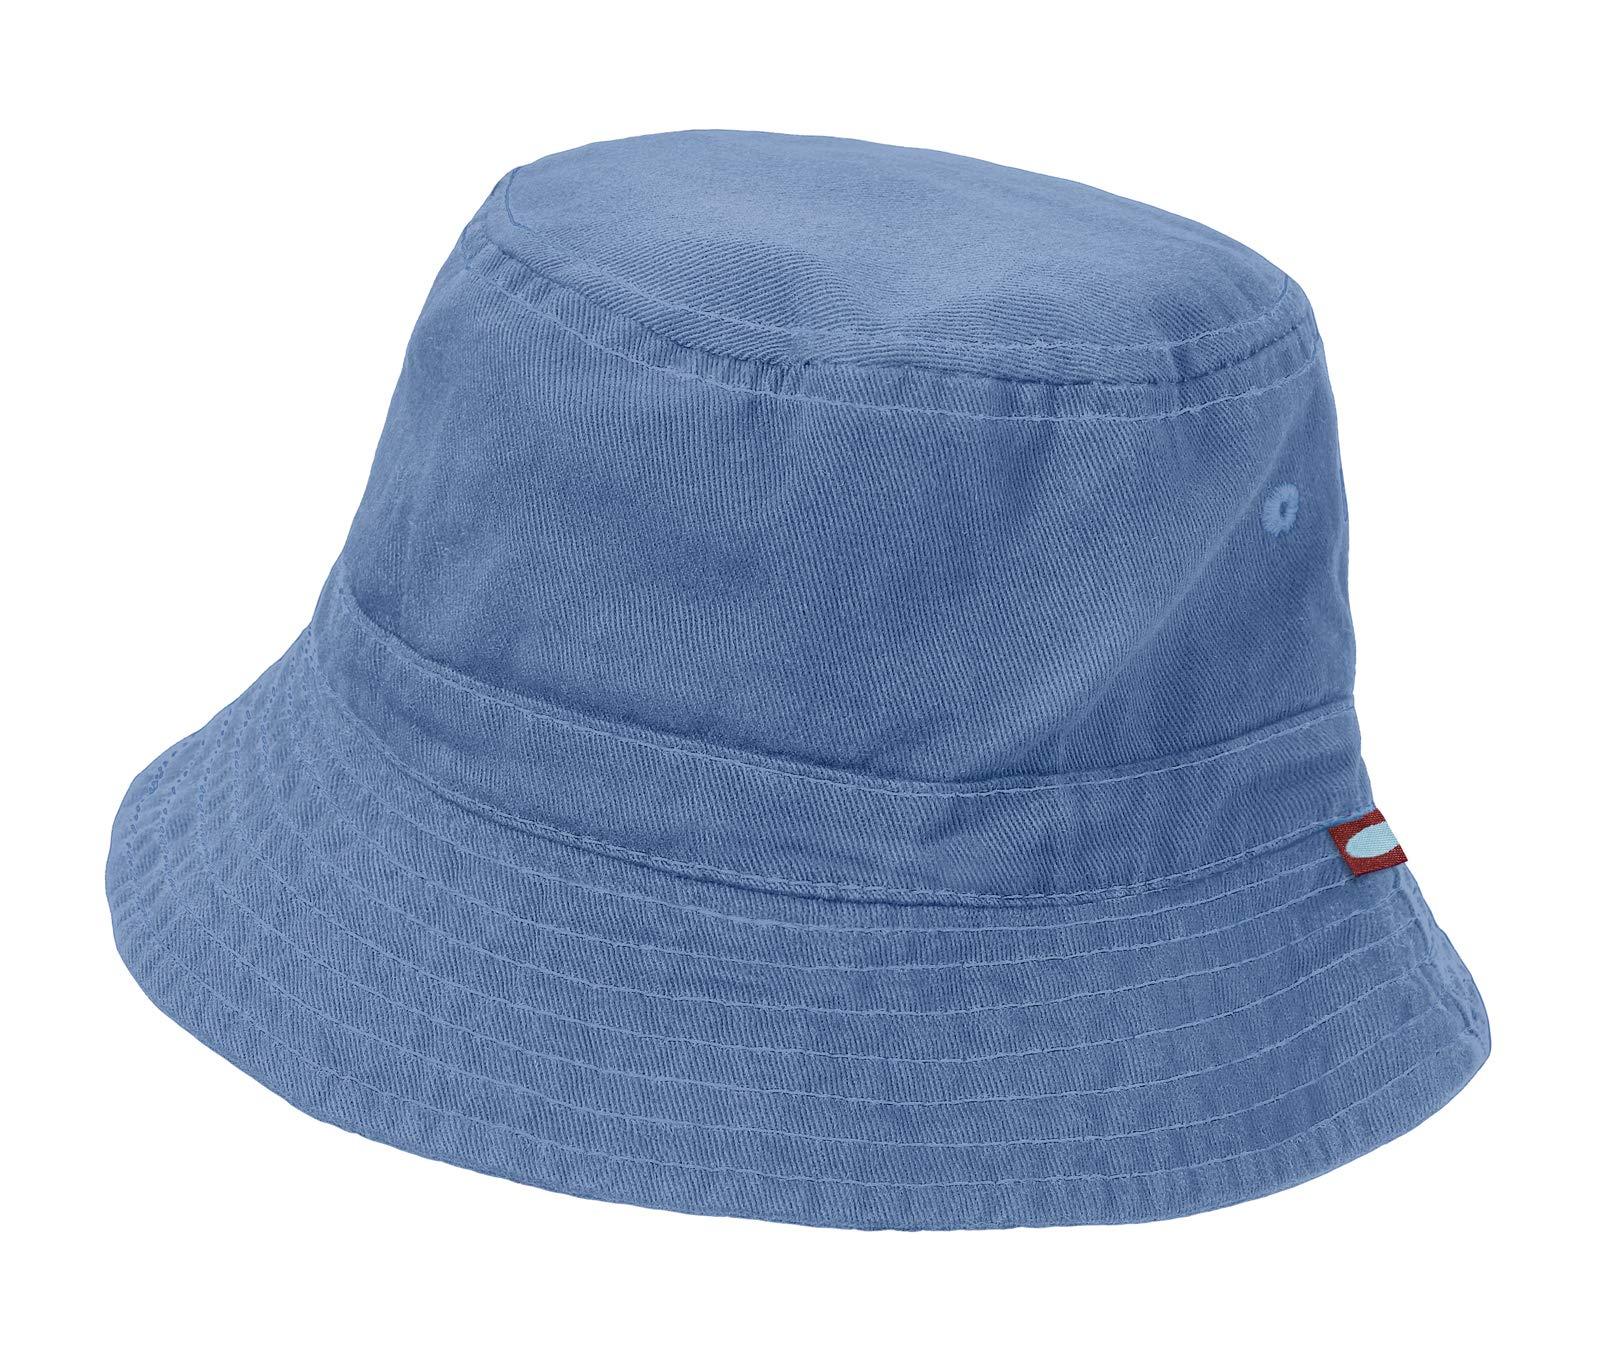 City Threads Unisex Baby Solid Wharf Hat Bucket Hat for Sun Protection SPF Beach Summer - Denim Blue - M(6-18M)